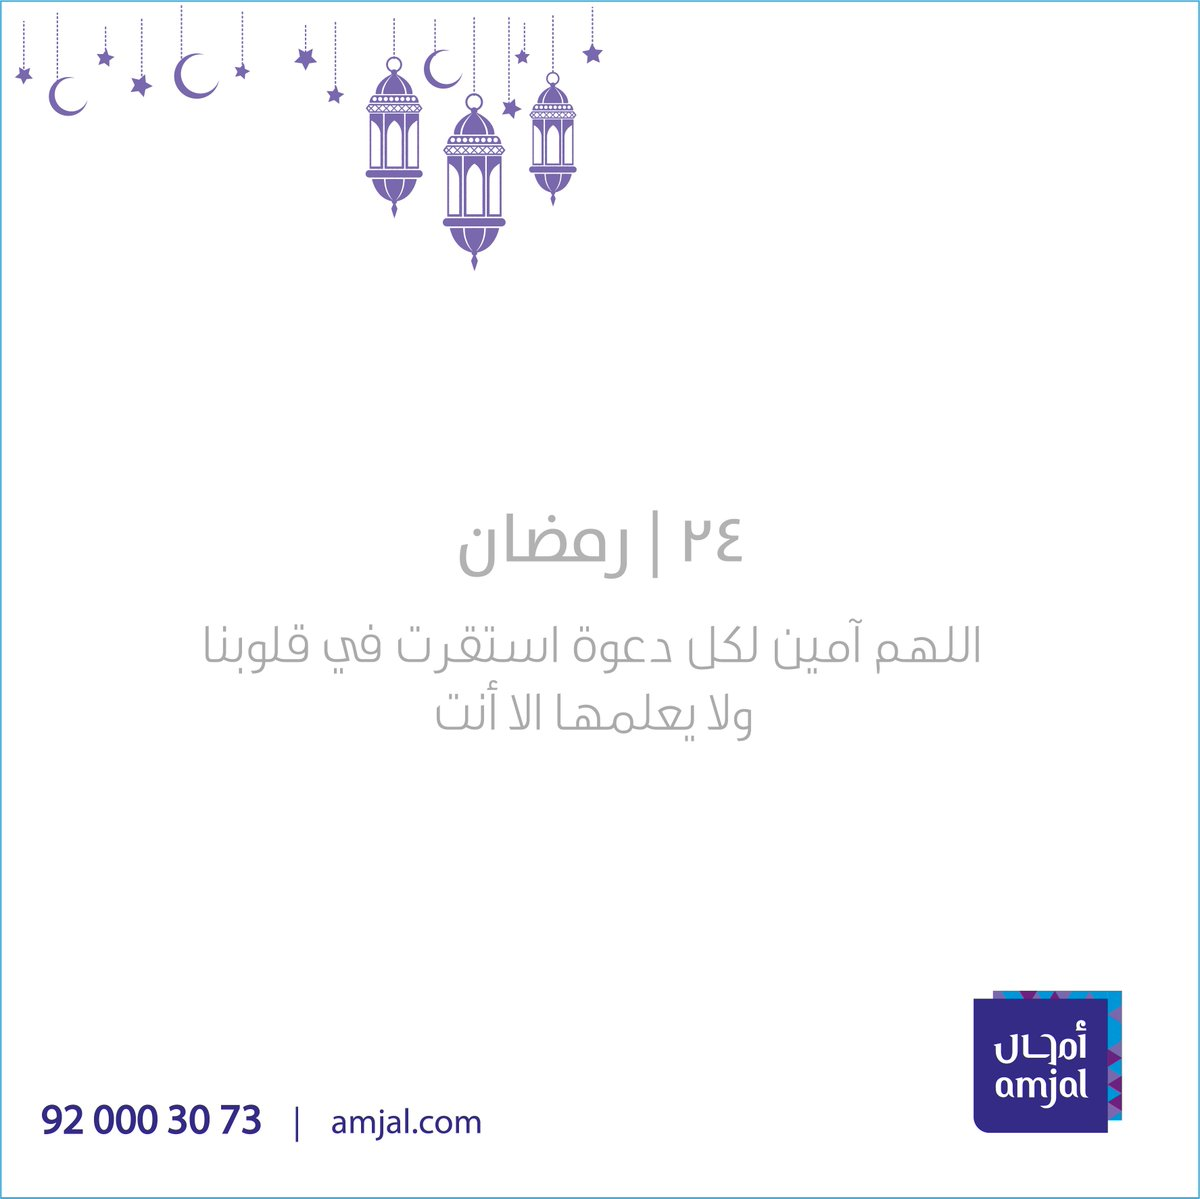 #دعاء_رمضان https://t.co/PN5PLXhBzF